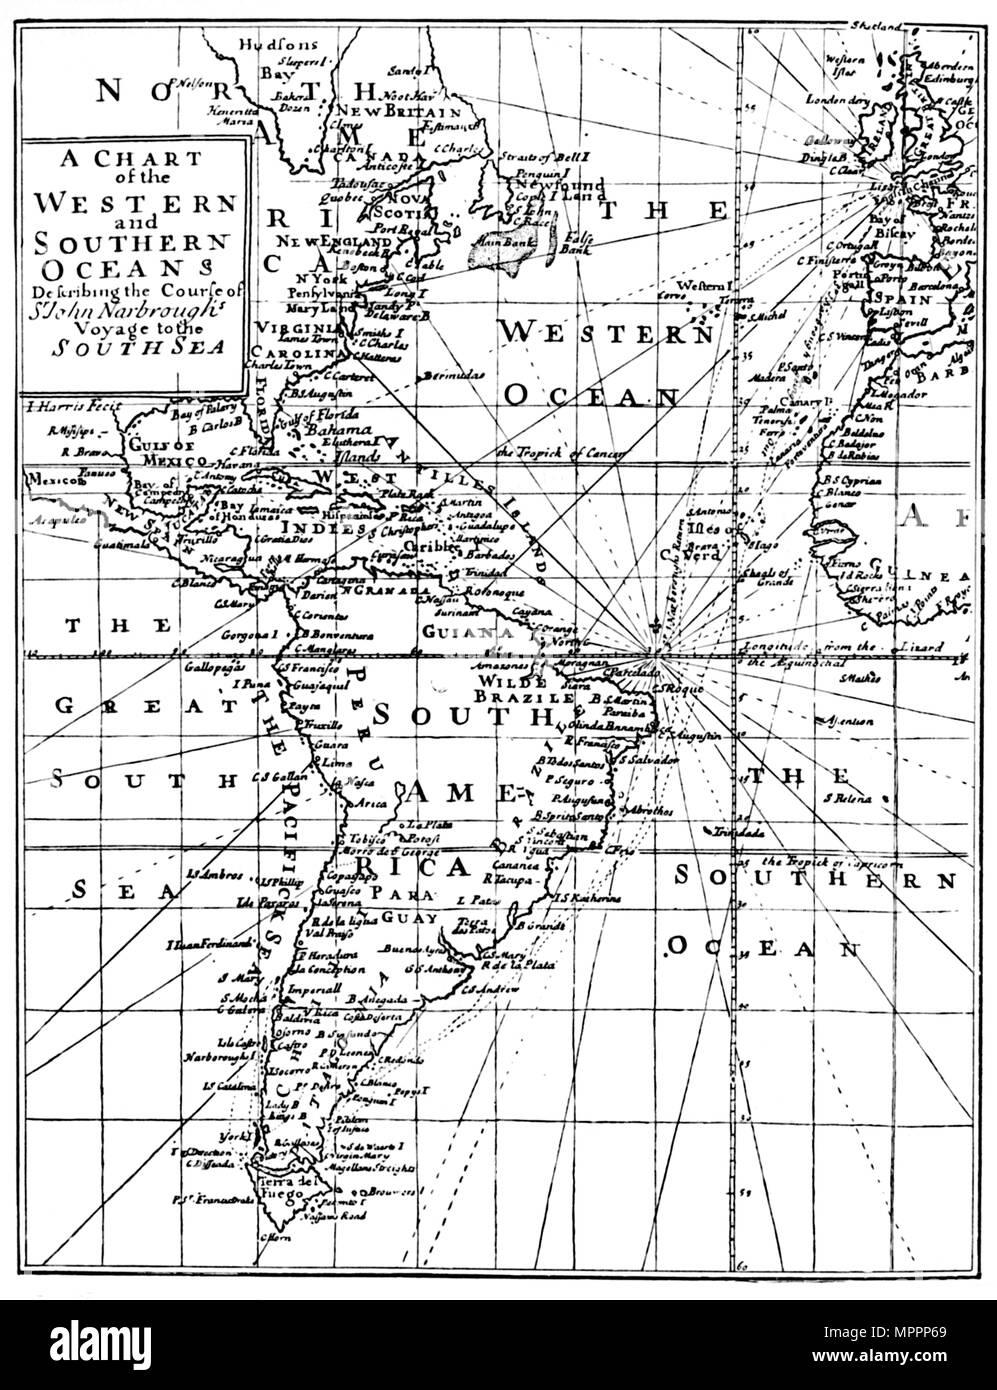 'Sir John Narbrough's Voyage', c1670, (1903). Artist: Unknown. - Stock Image